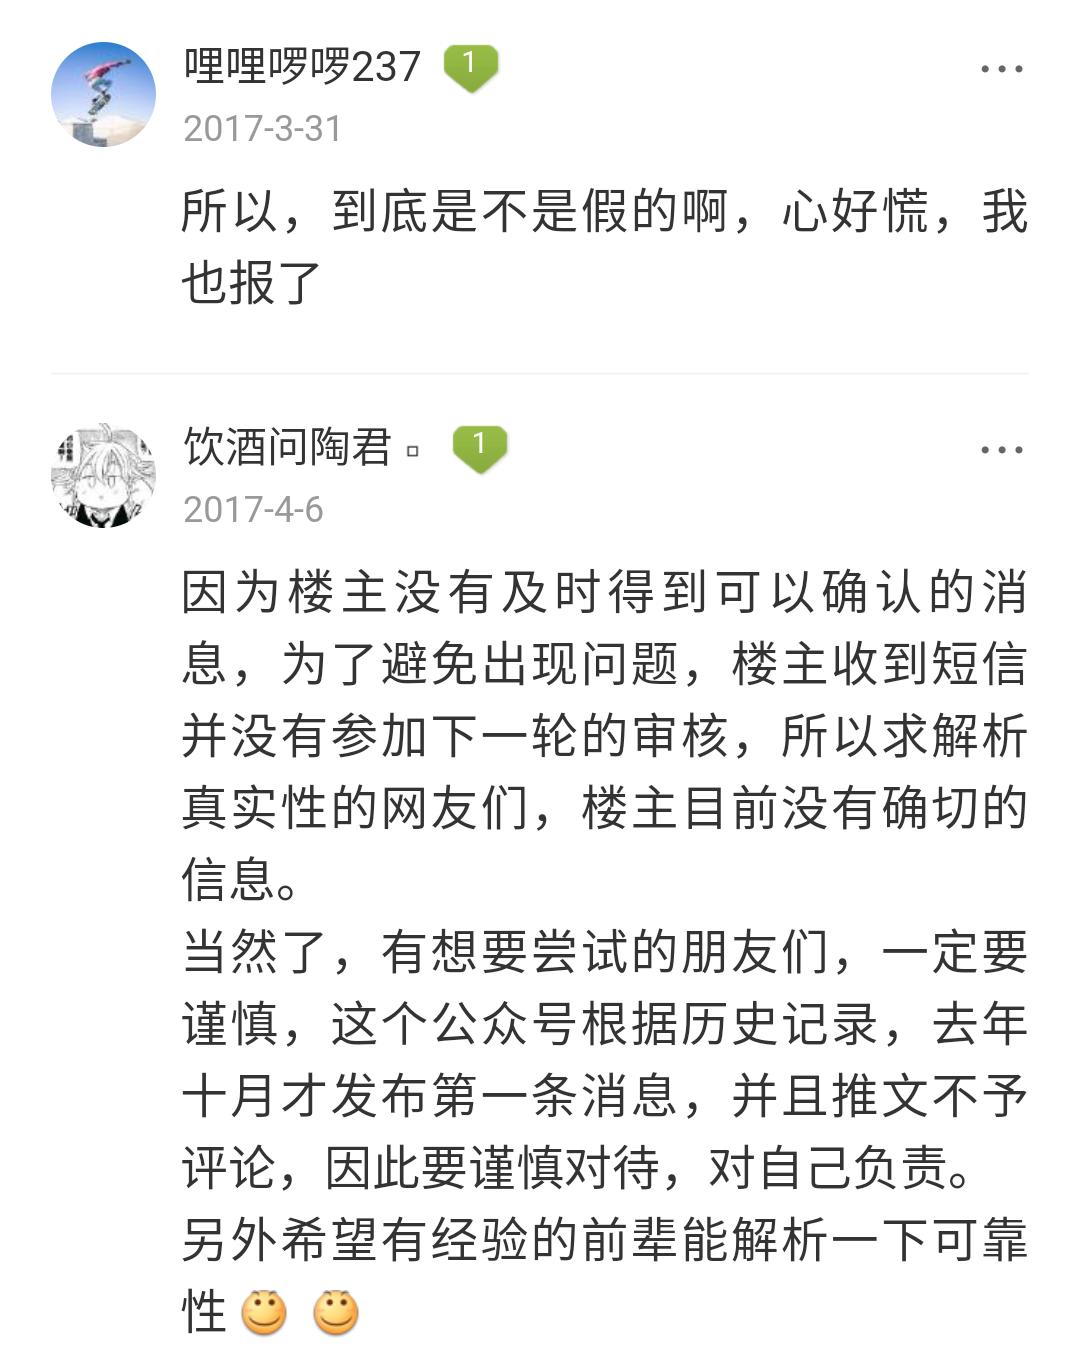 Screenshot_2018-12-04-06-50-27.png